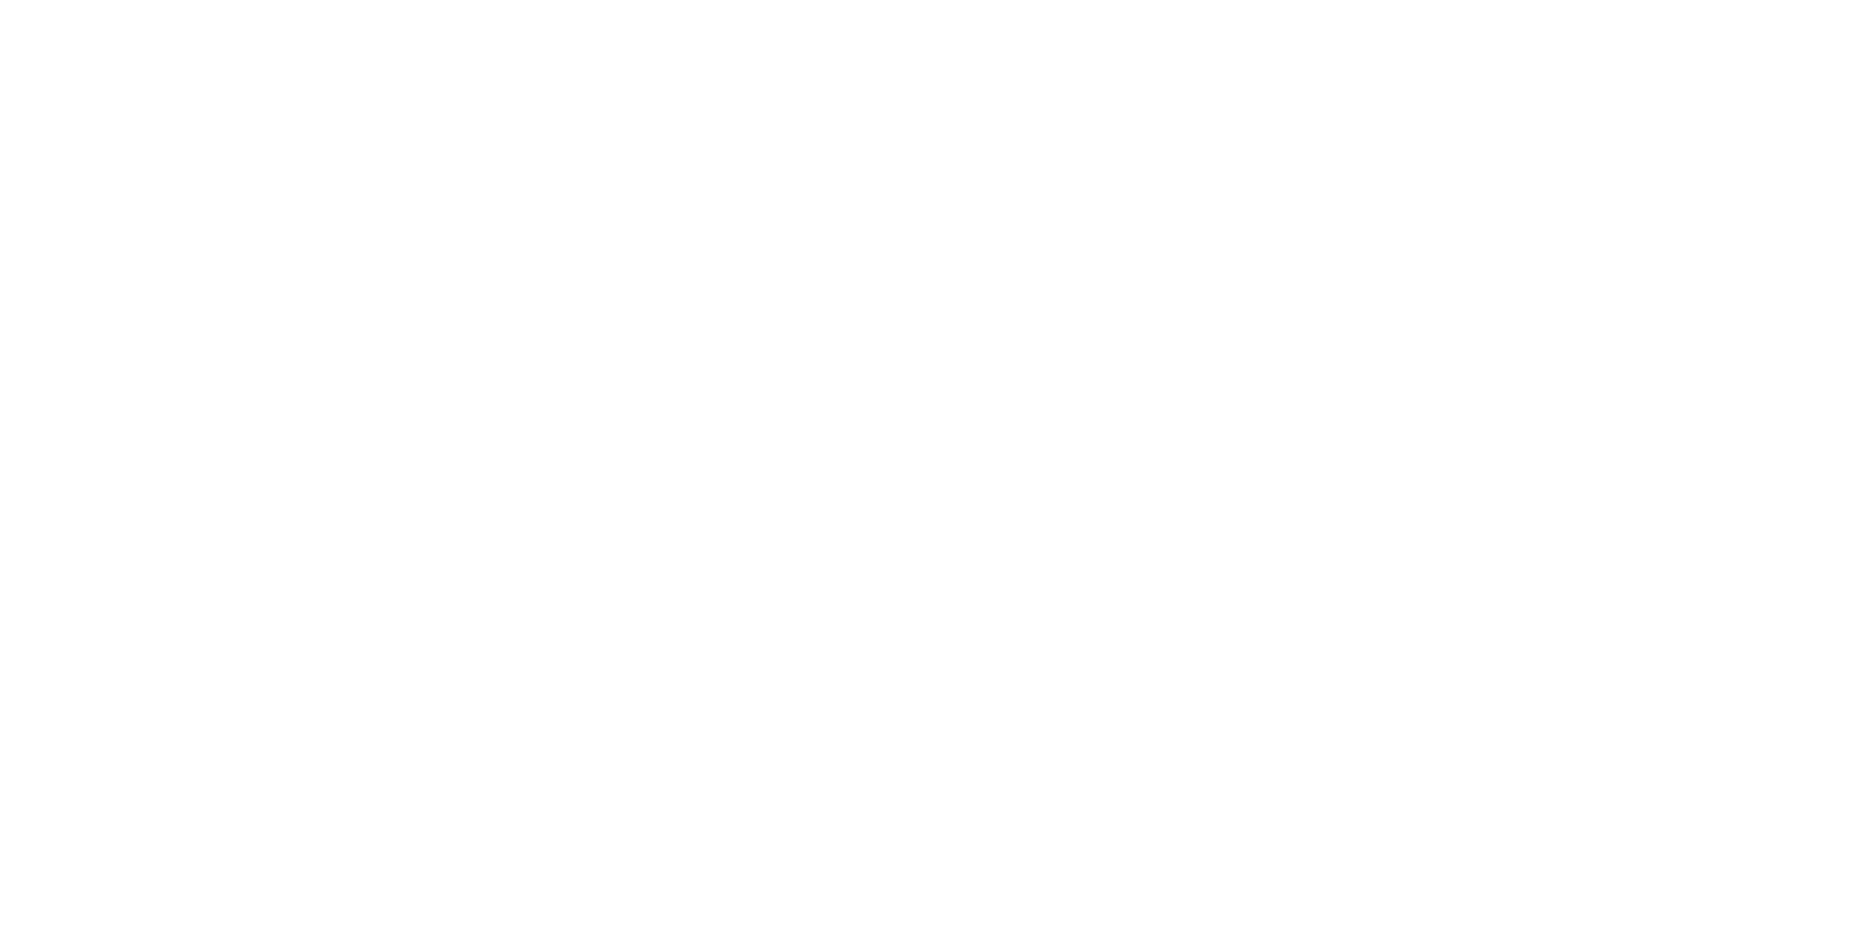 logo-design-2 3